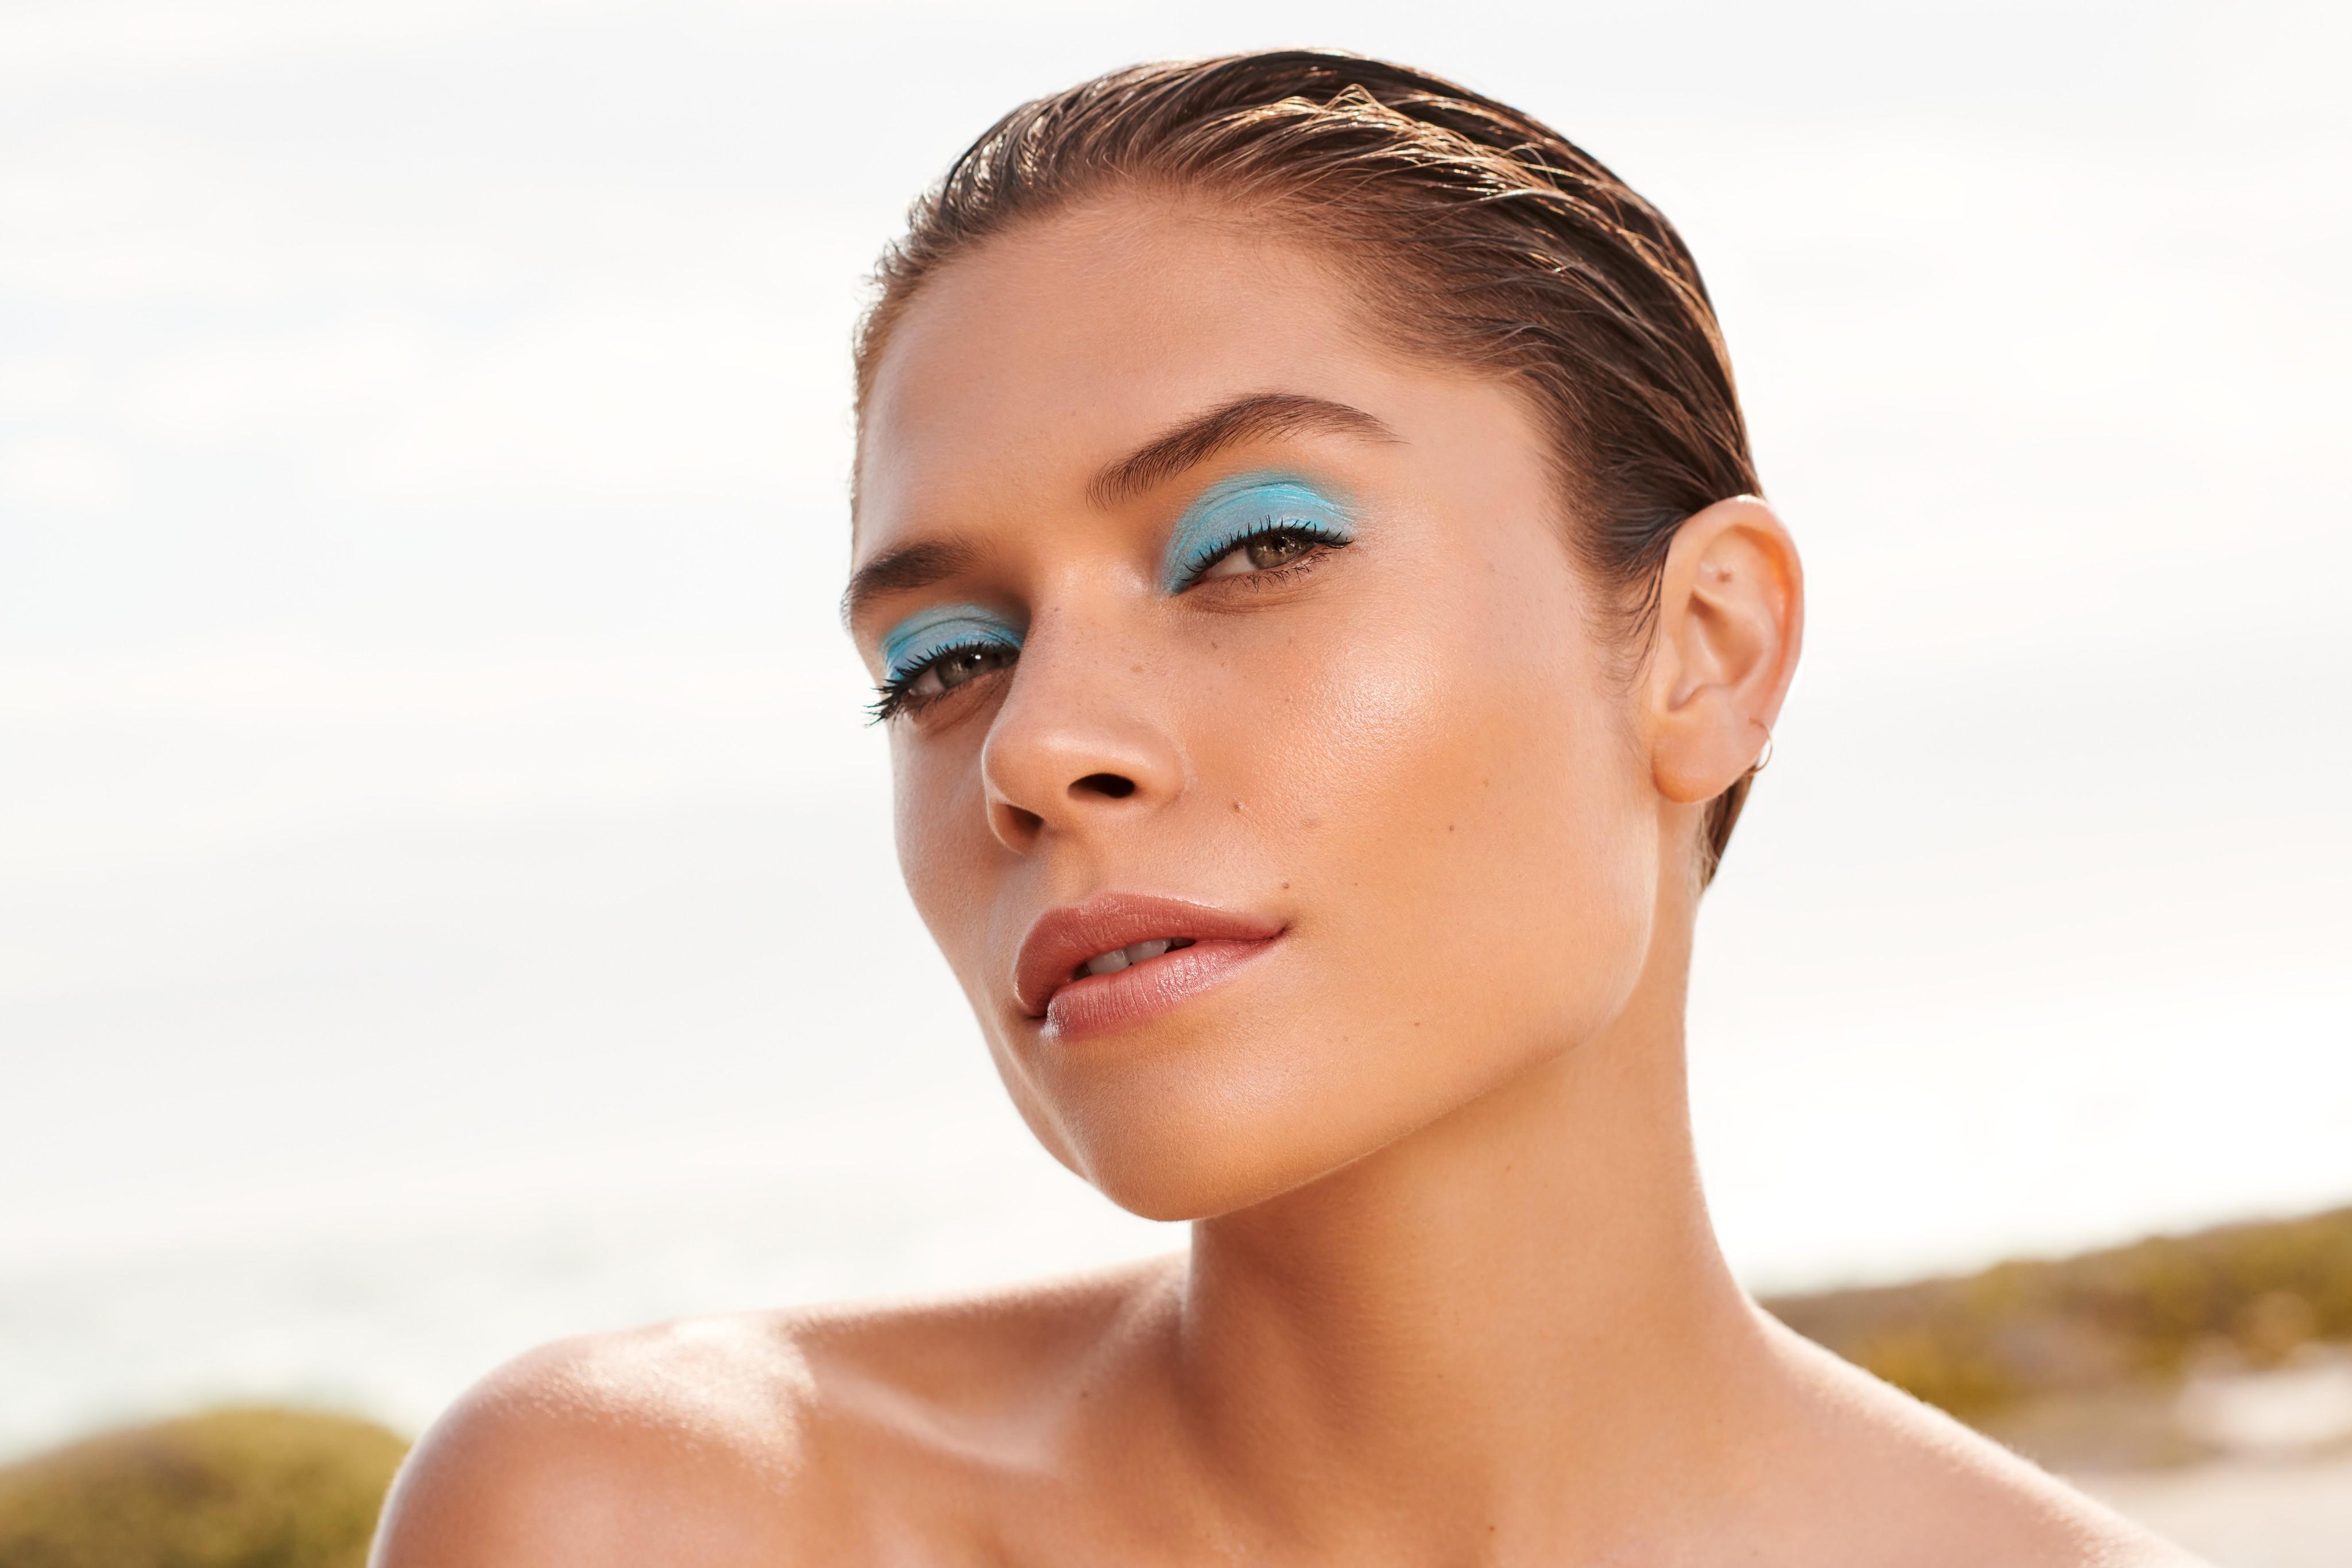 Crosscategory-beautyvisual-woman-blue-eyeshadow-062022-Web-Rendition